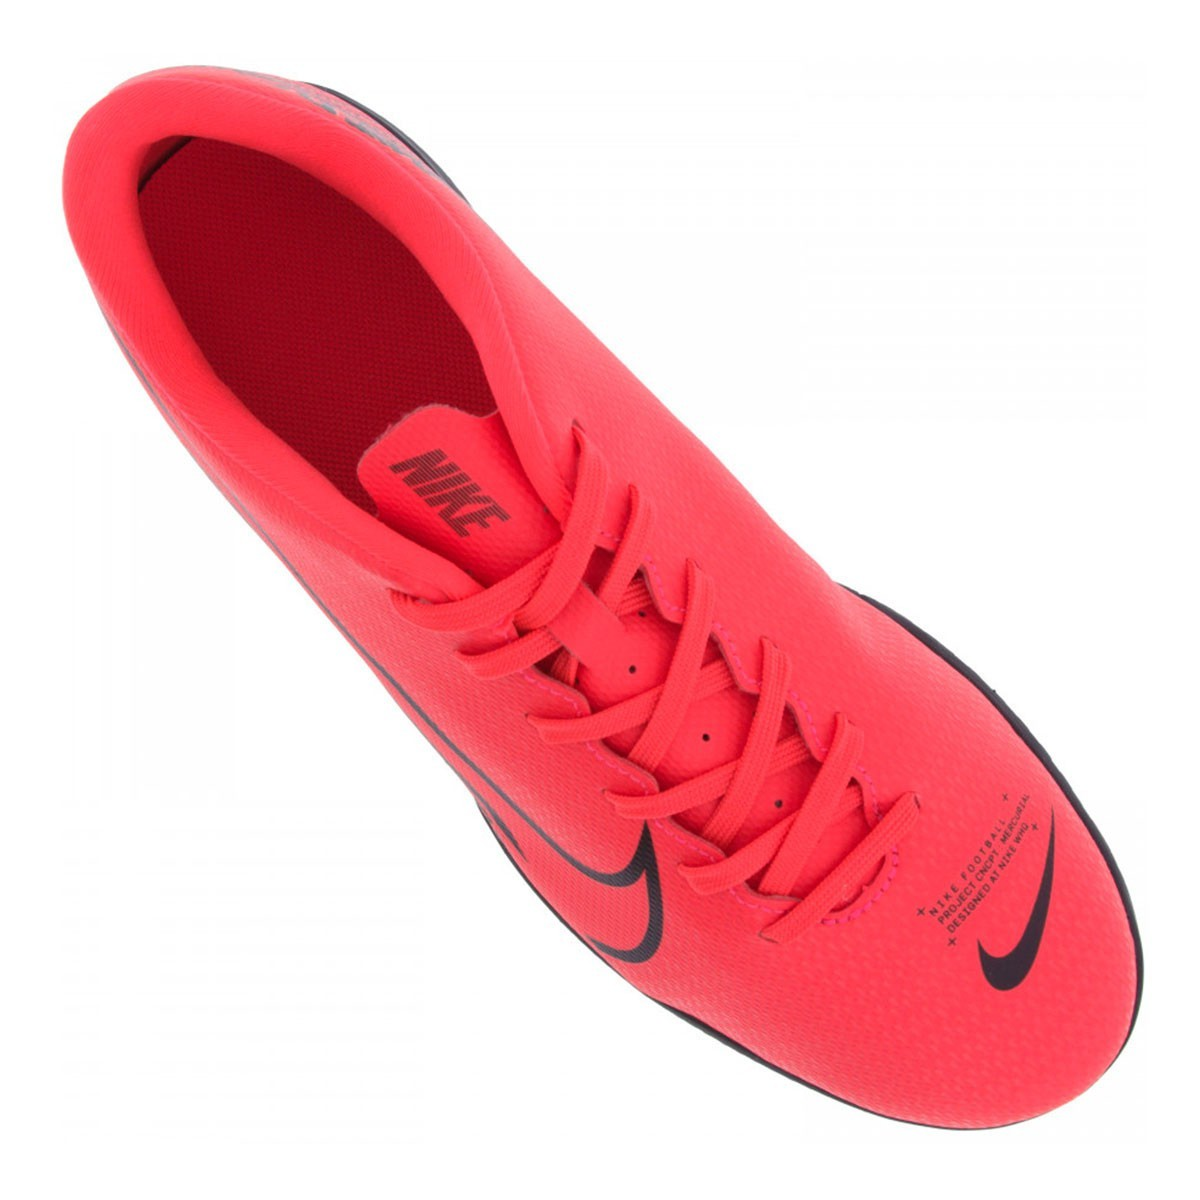 Chuteira Futsal Nike Mercurial Vapor 13 Club IC Vermelho e Preto